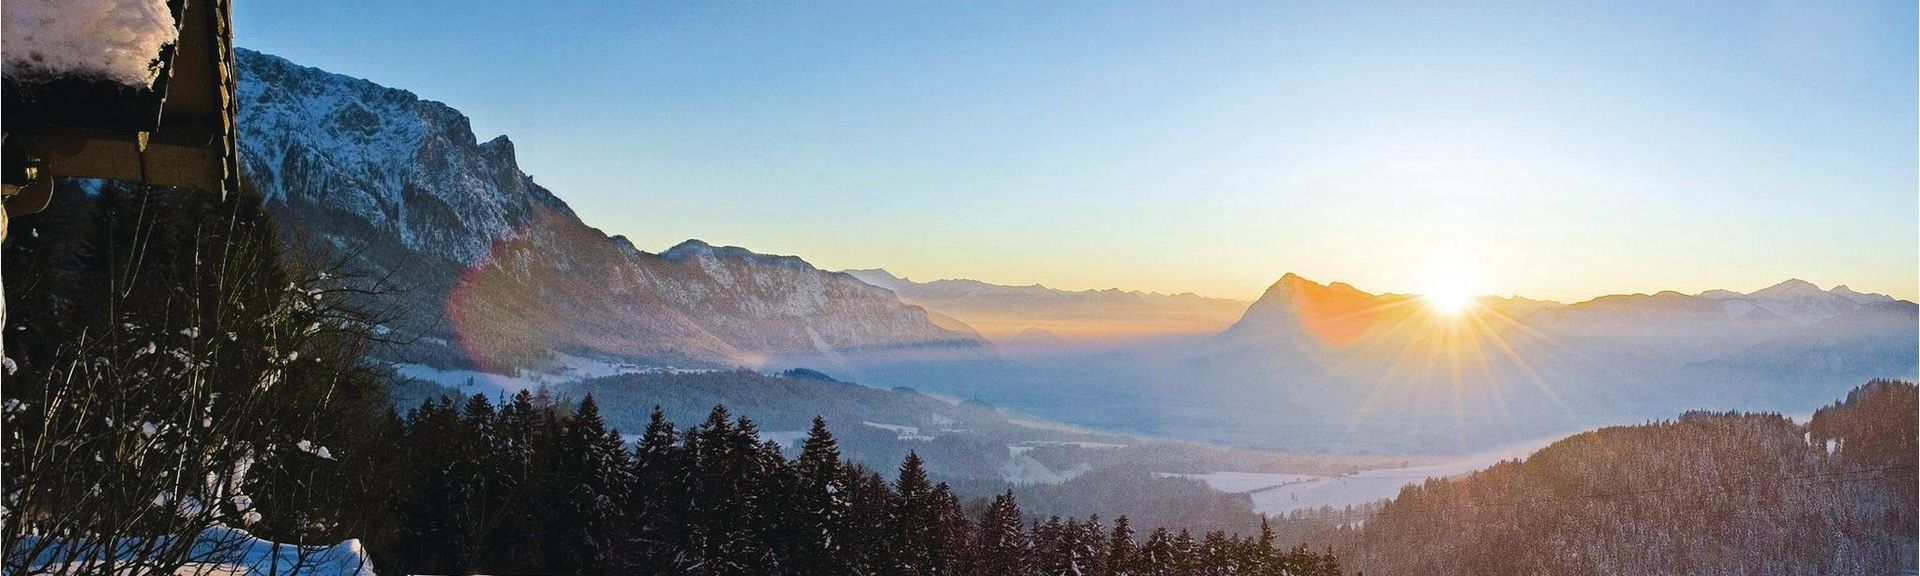 Auerbach, Oberaudorf, Bavière, Allemagne